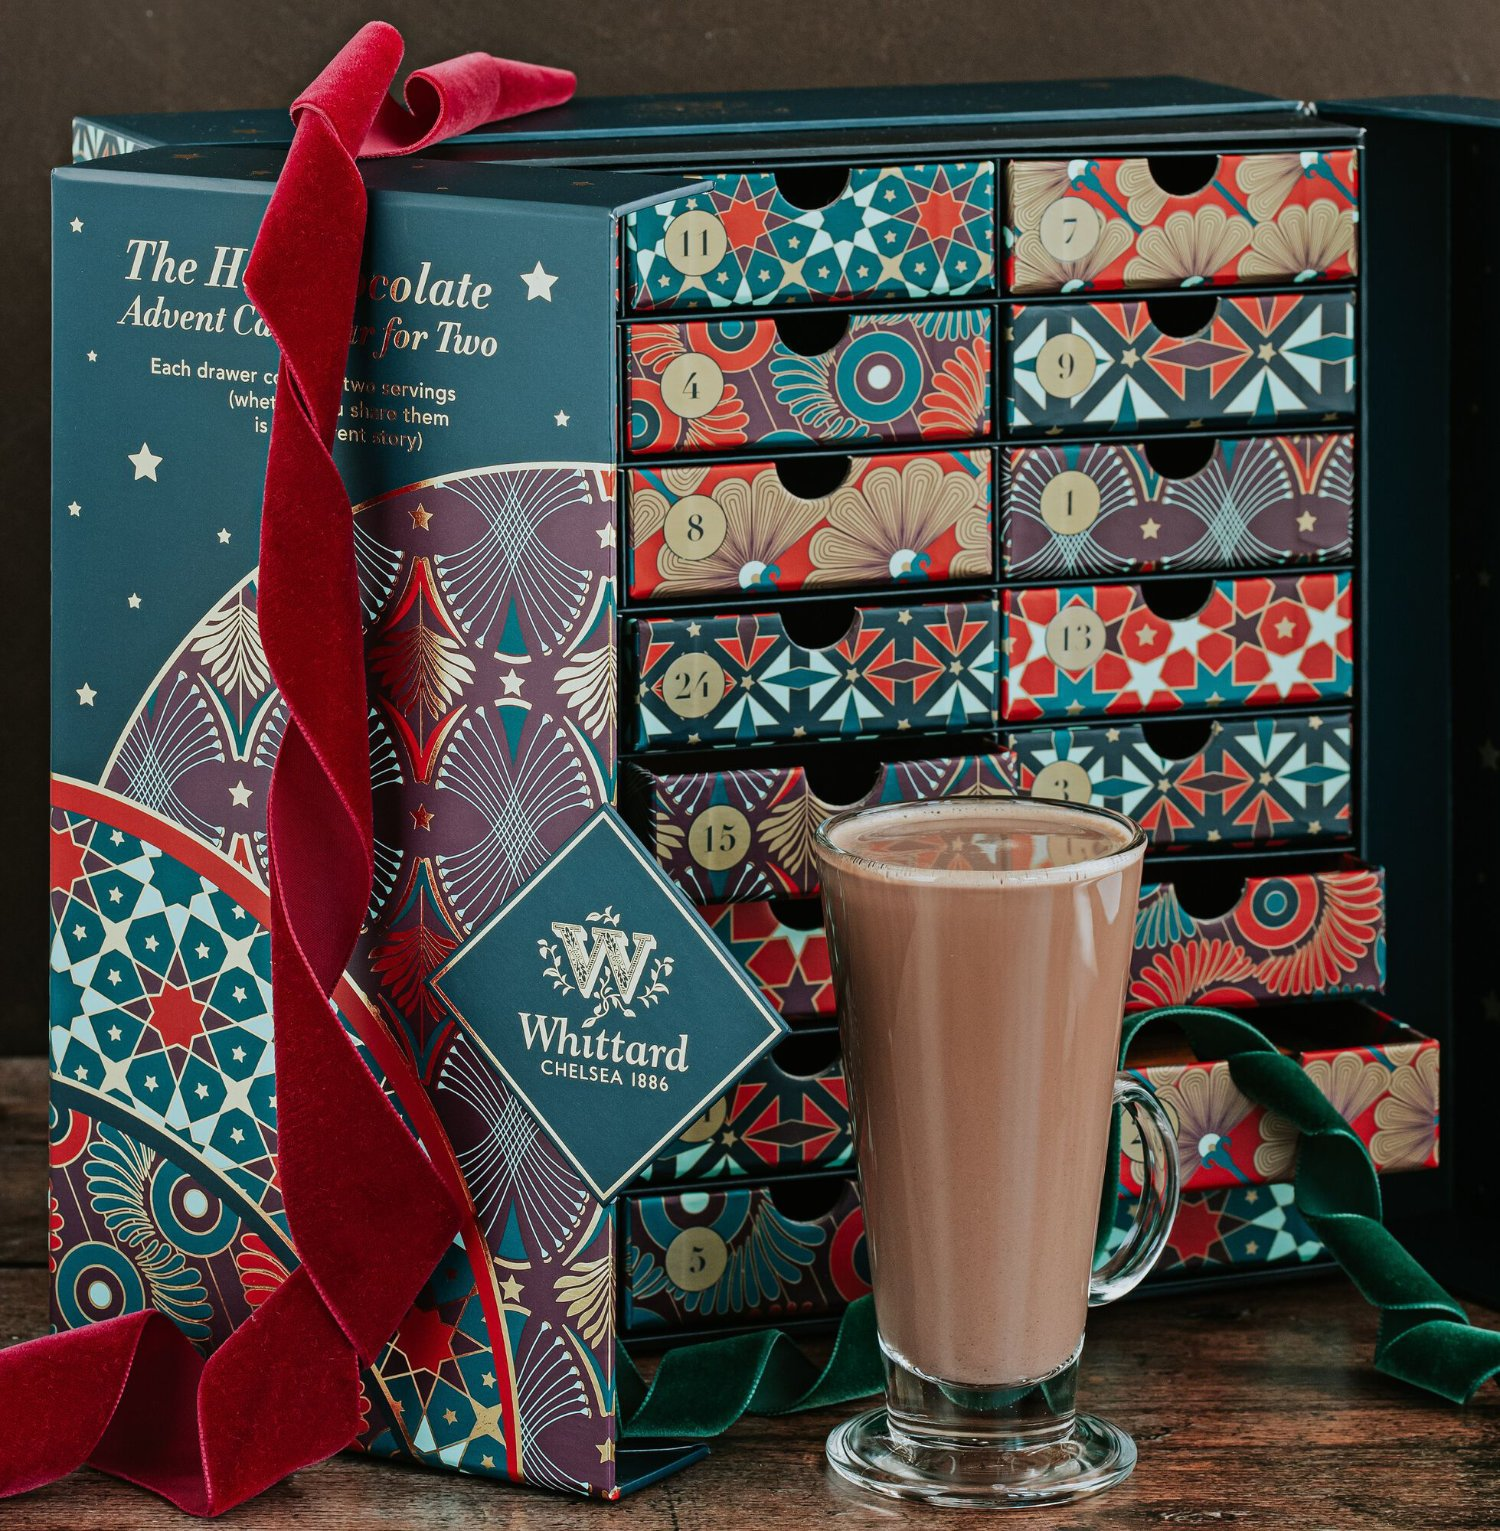 advent-calendar-hotchocolate-hygge-cozy-2020-christmas-nordic